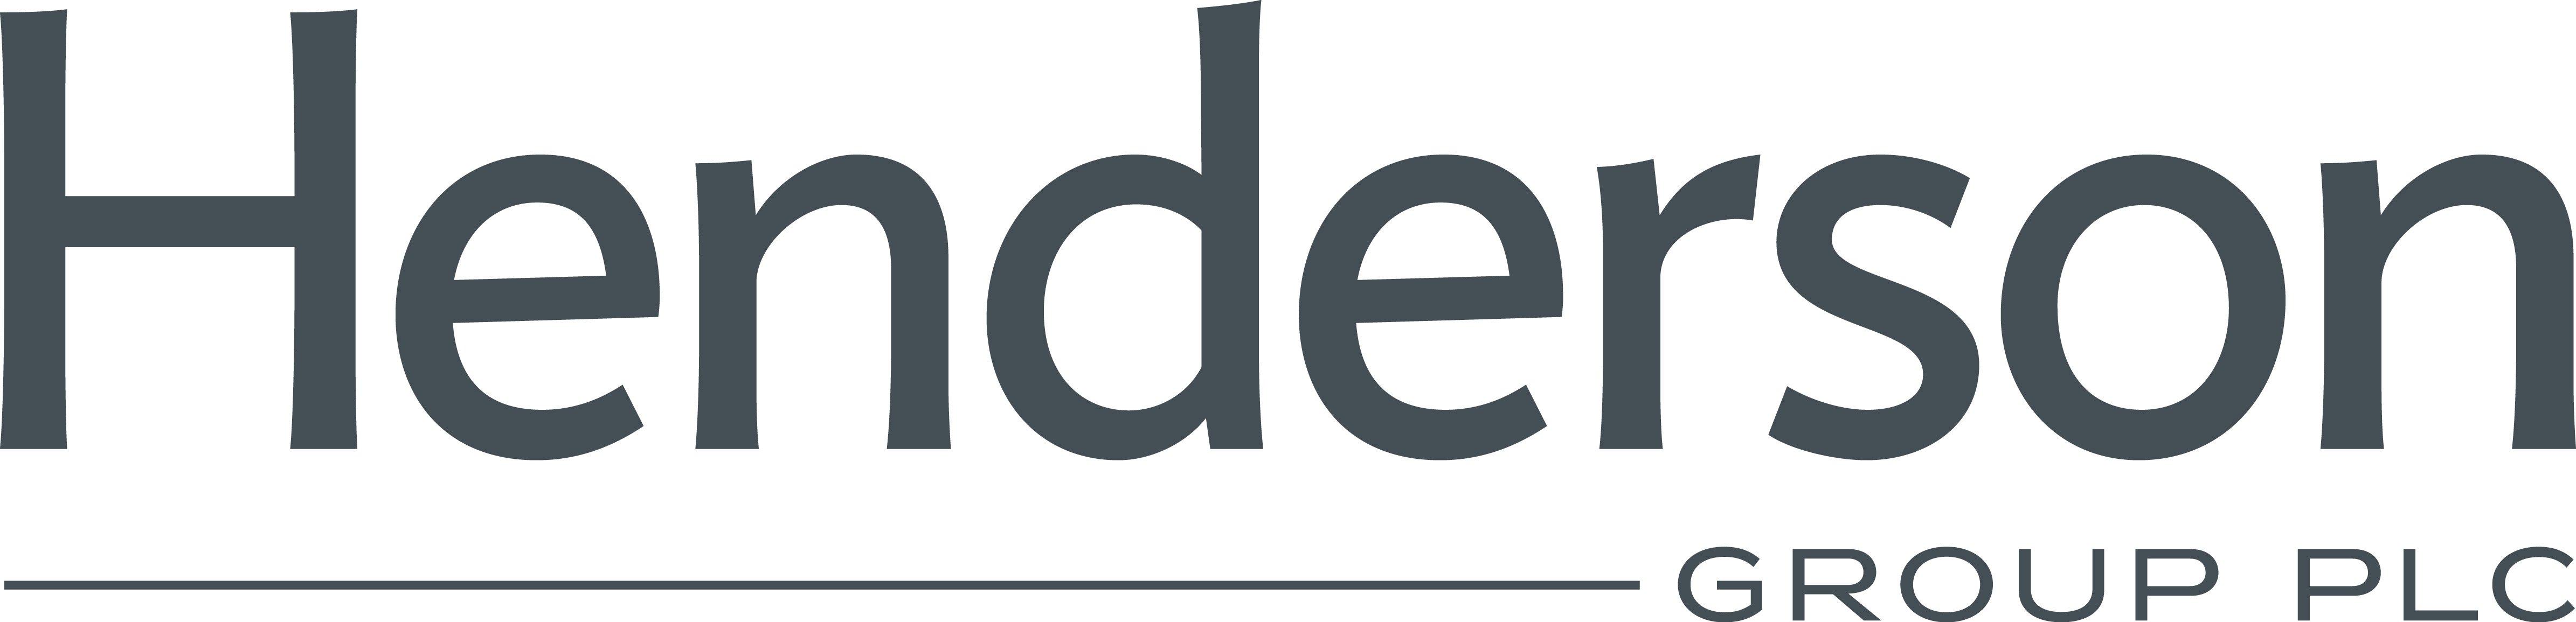 Henderson Group Plc logo